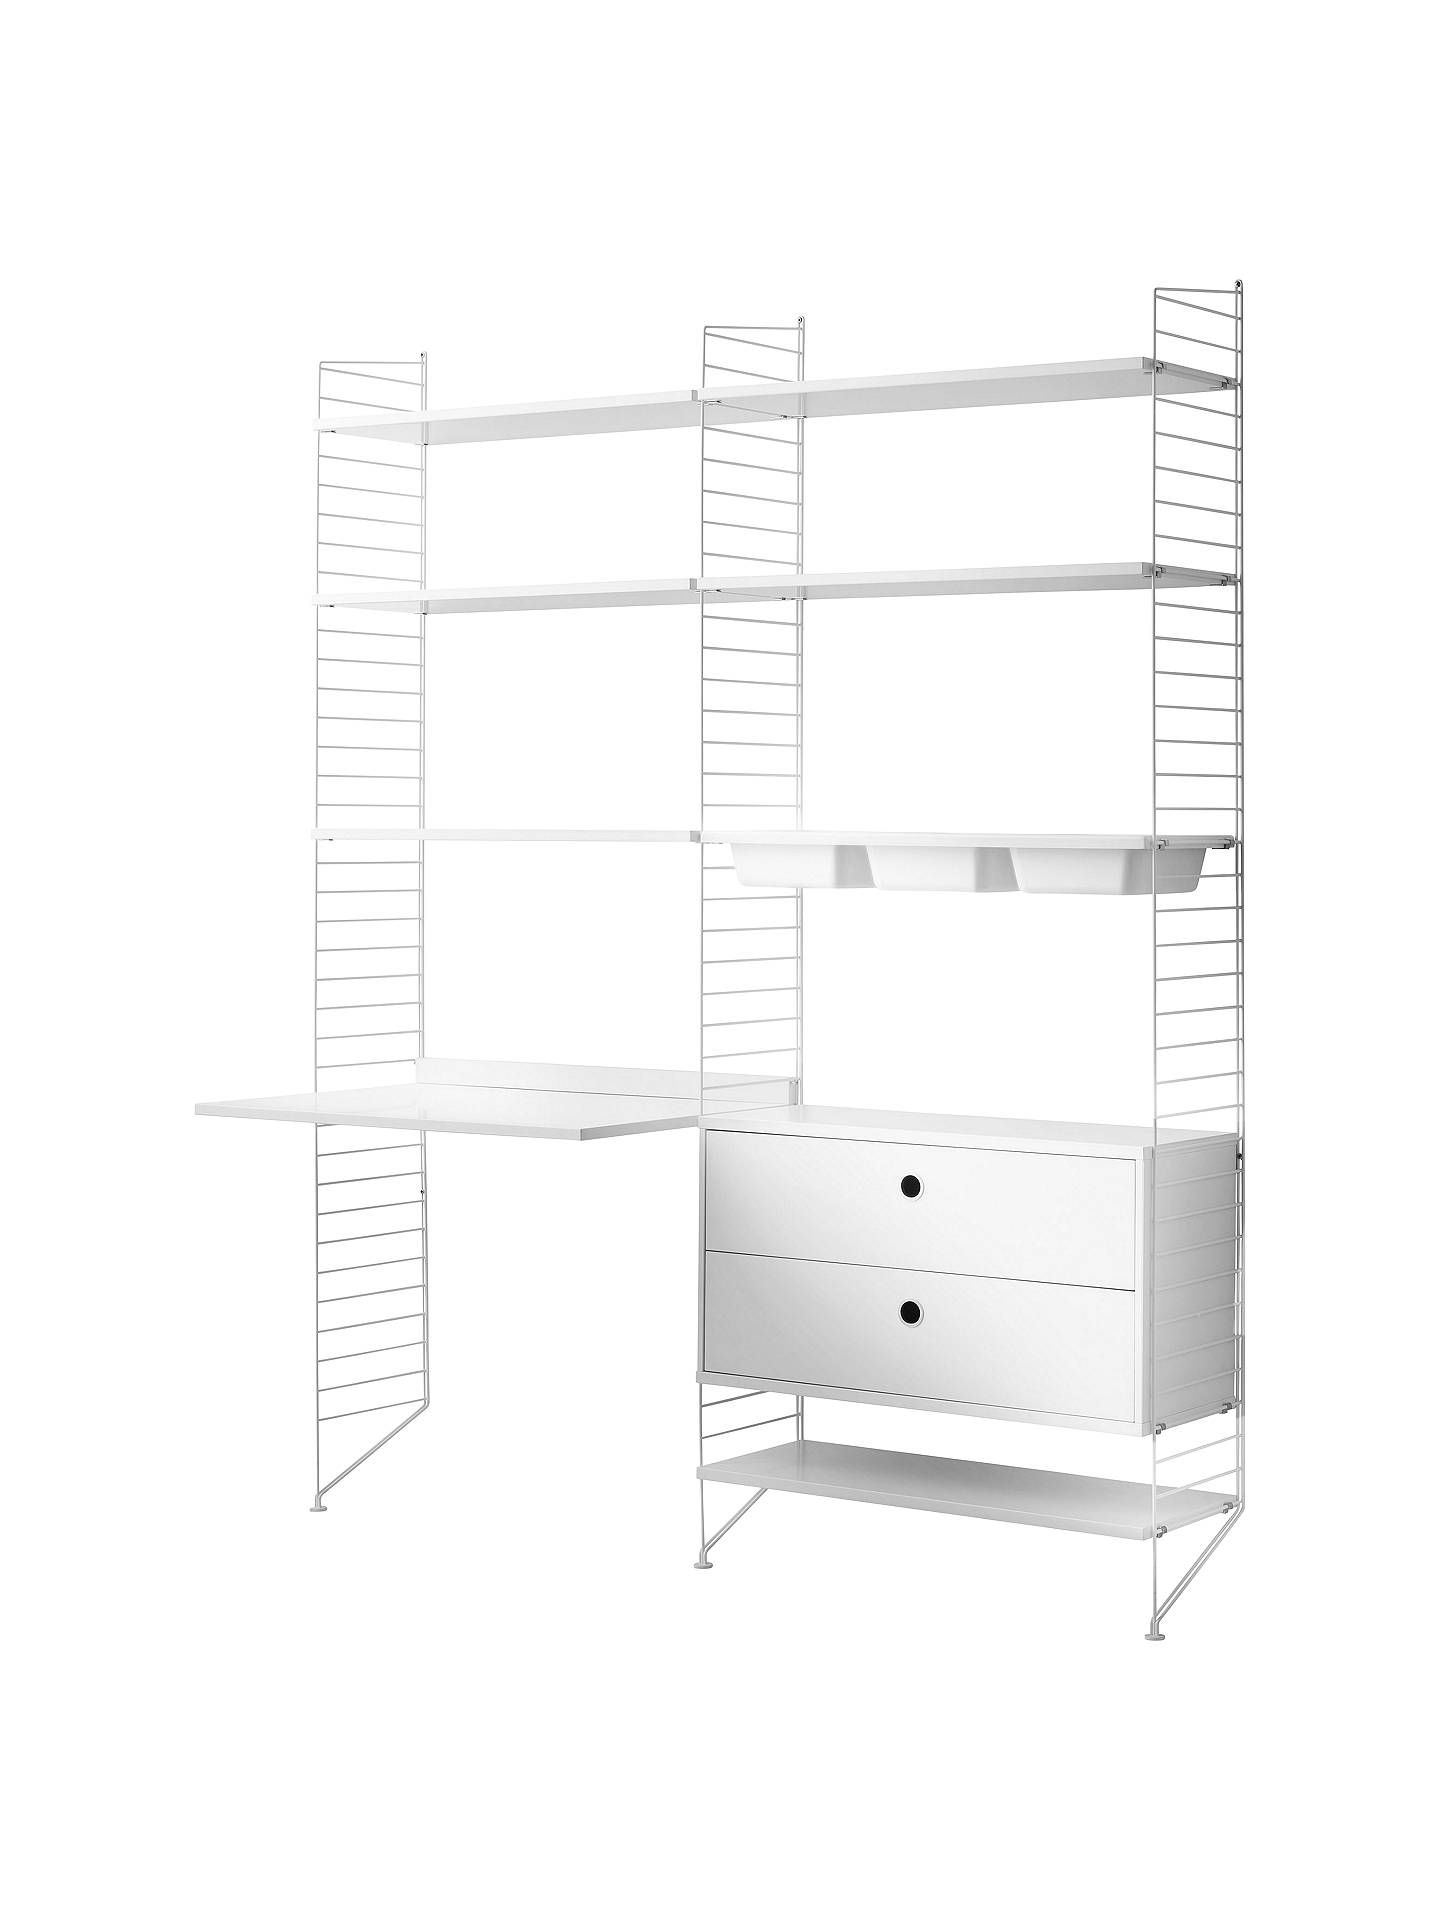 String Shelving Unit With Work Desk Shelves 2 Drawer Chest 3 Bowl Shelf And Wall Fastened Side Racks White